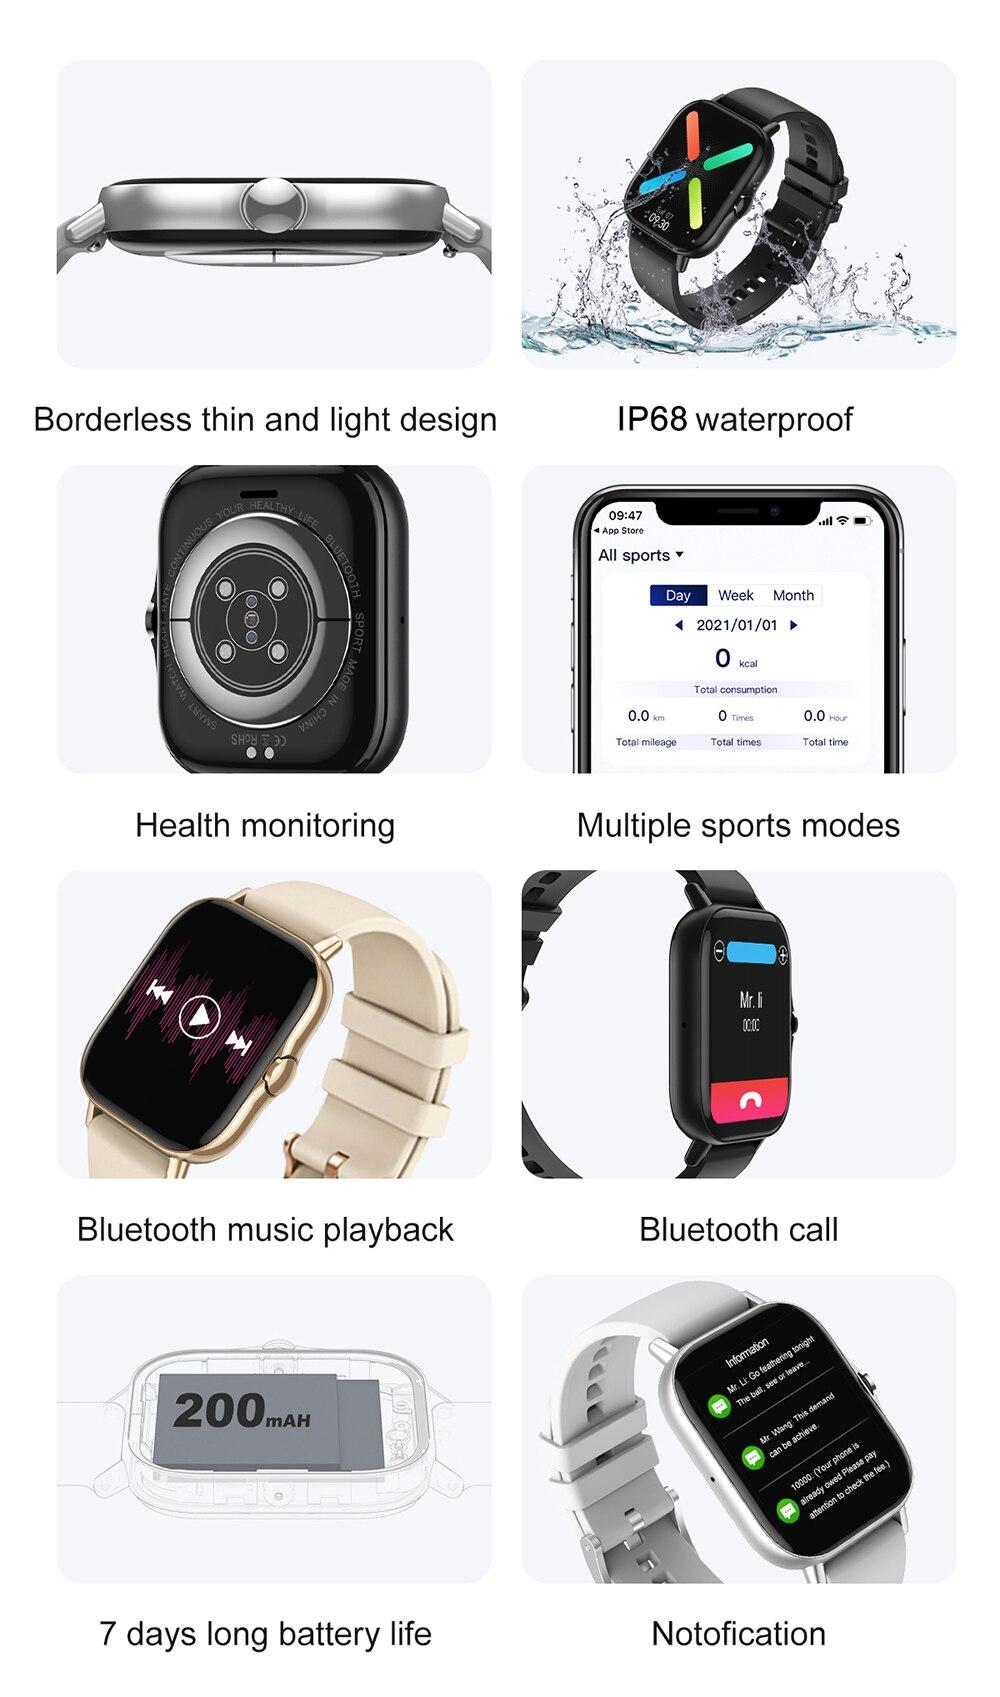 Hf3a85029d6c343ac828e3f0c6ab5f54bO For Xiaomi Apple Phone IOS Reloj Inteligente Hombre Smartwatch 2021 Men Bluetooth Call Smart Watch Man Woman Full Touch IP68